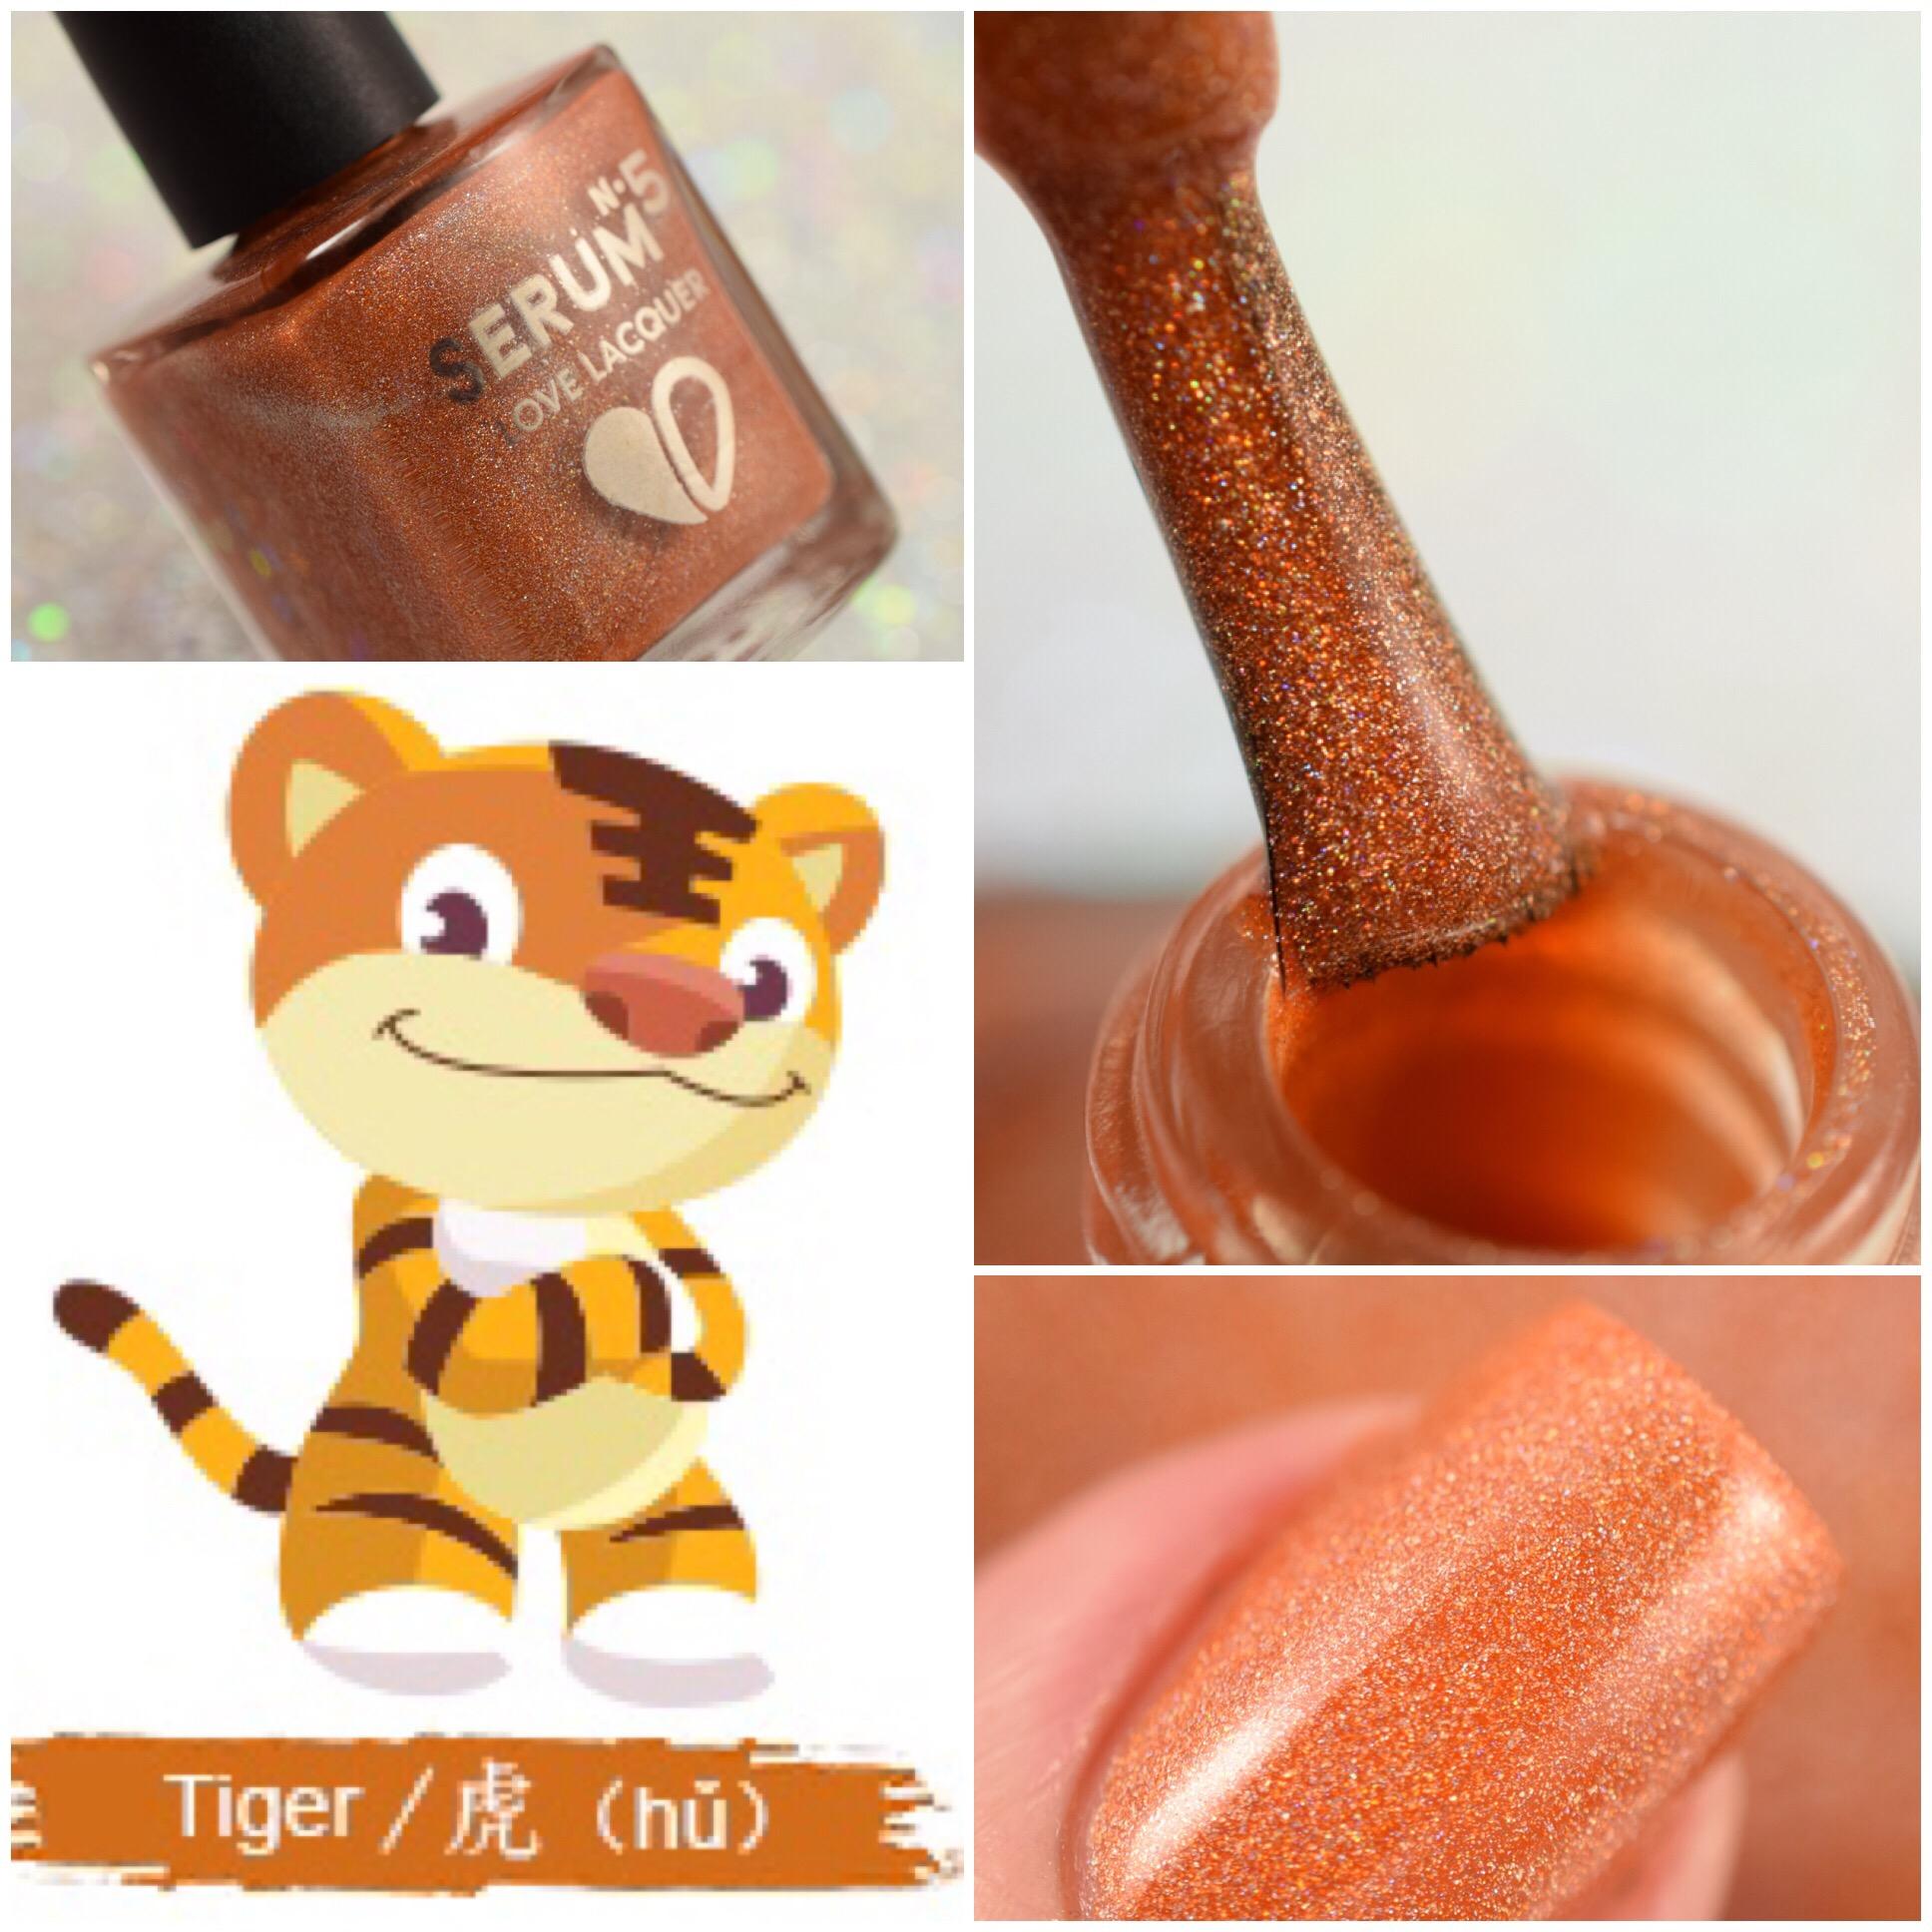 Serum No5 Tiger